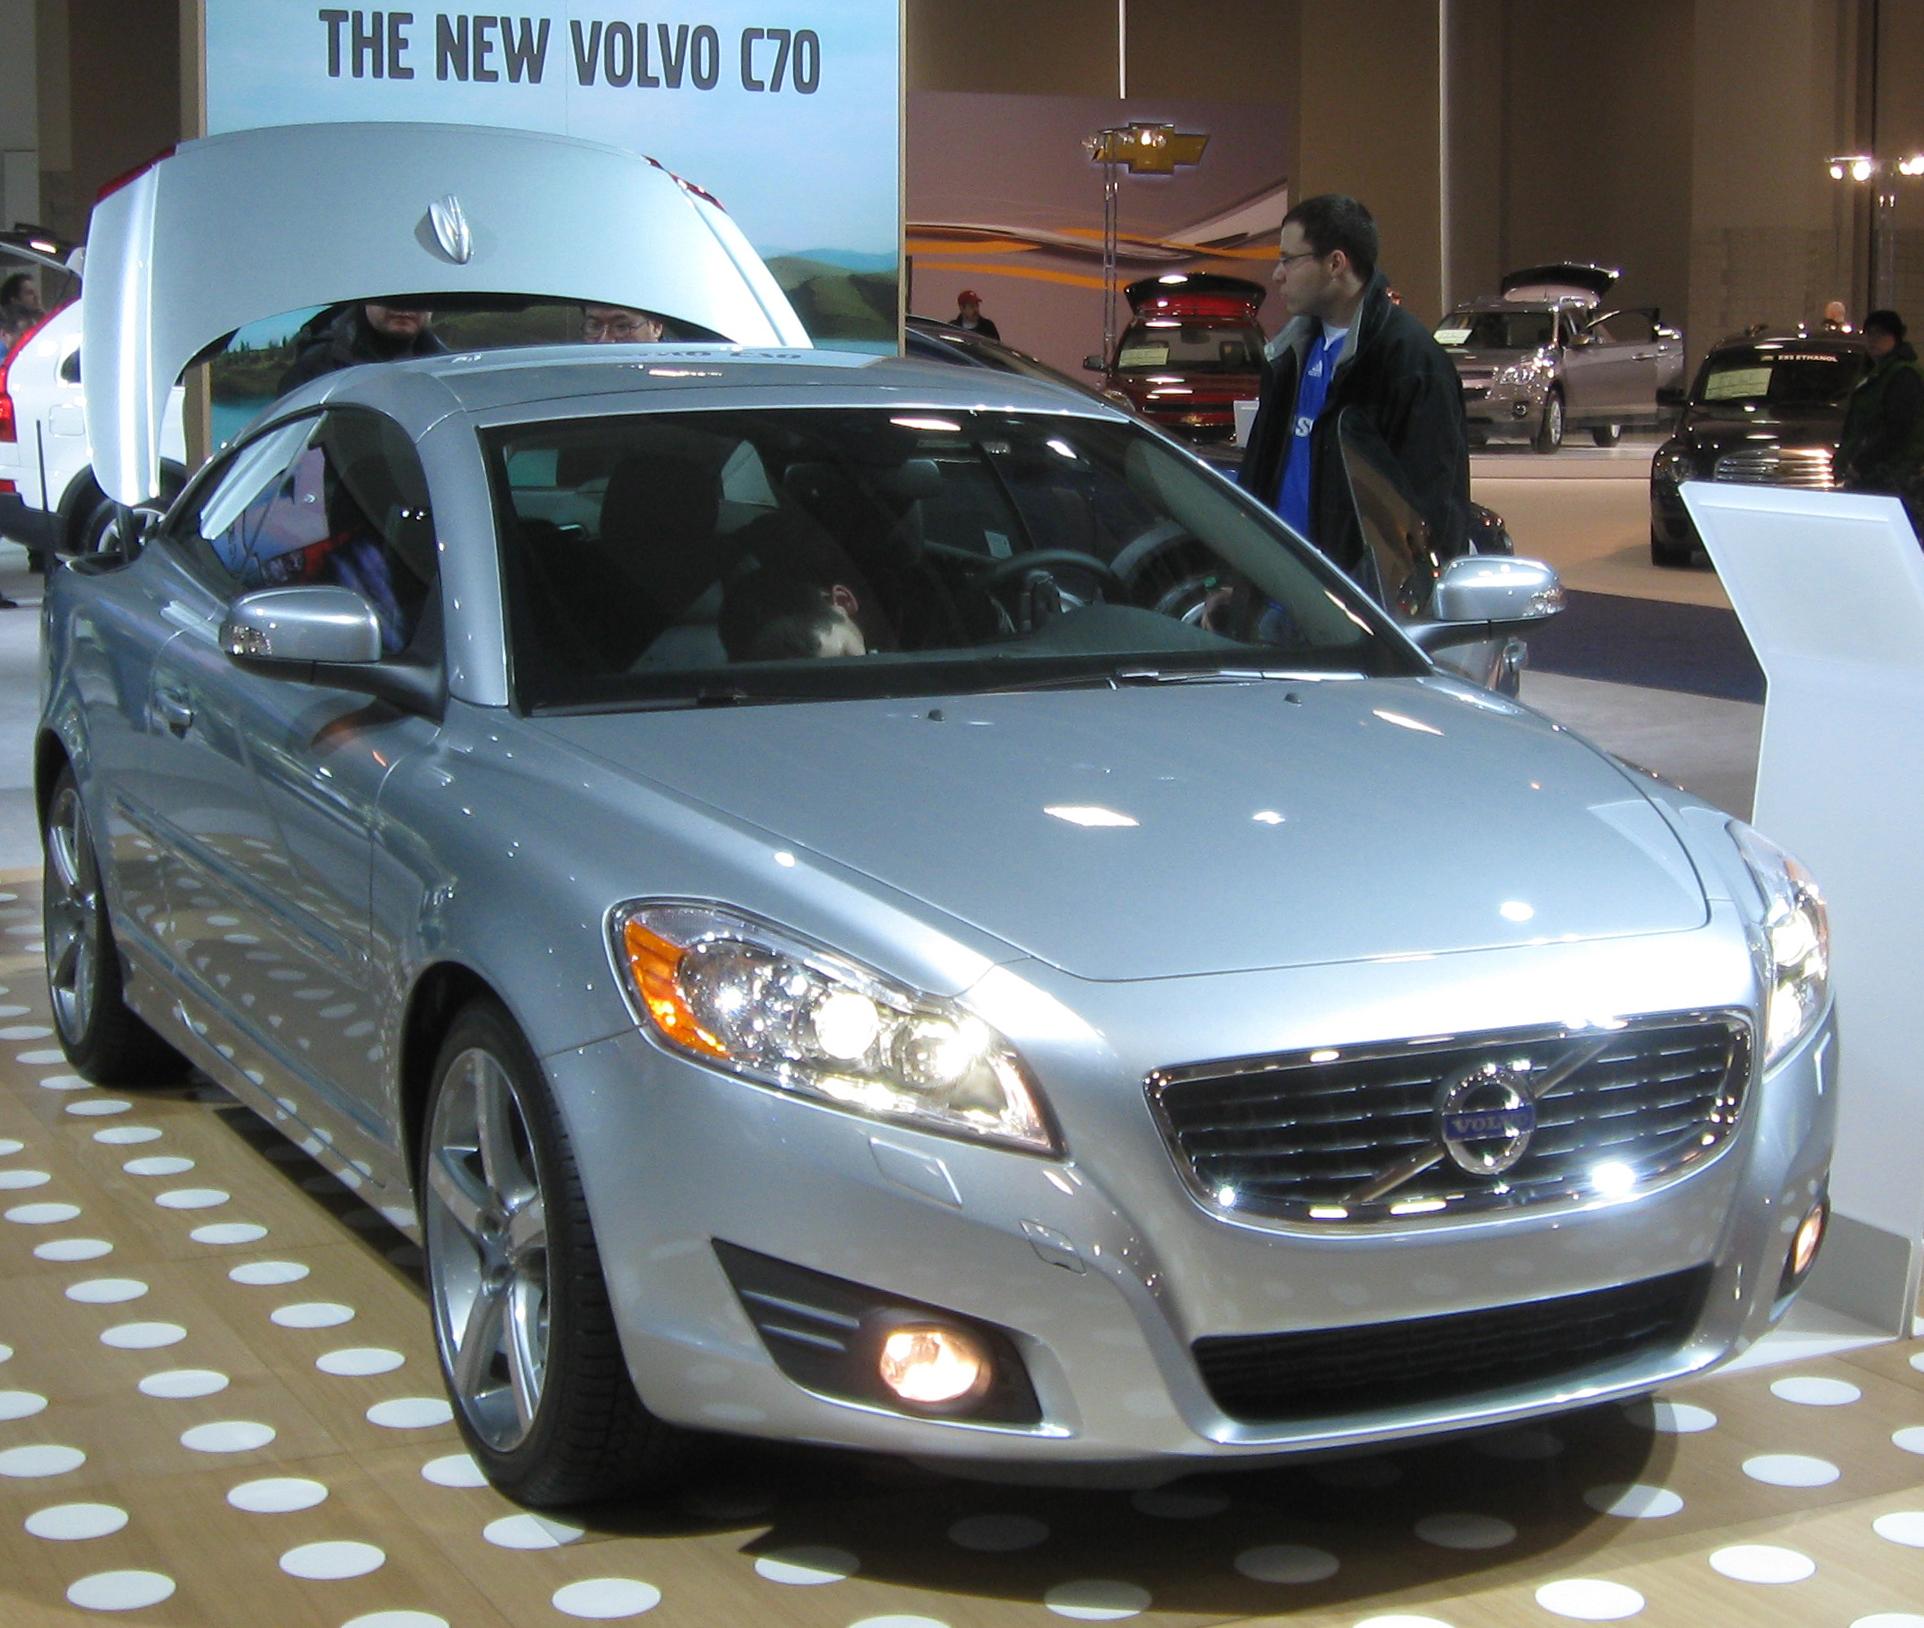 Hyundai Panama City Fl: 2010 Volvo C70 D4 Automatic Related Infomation